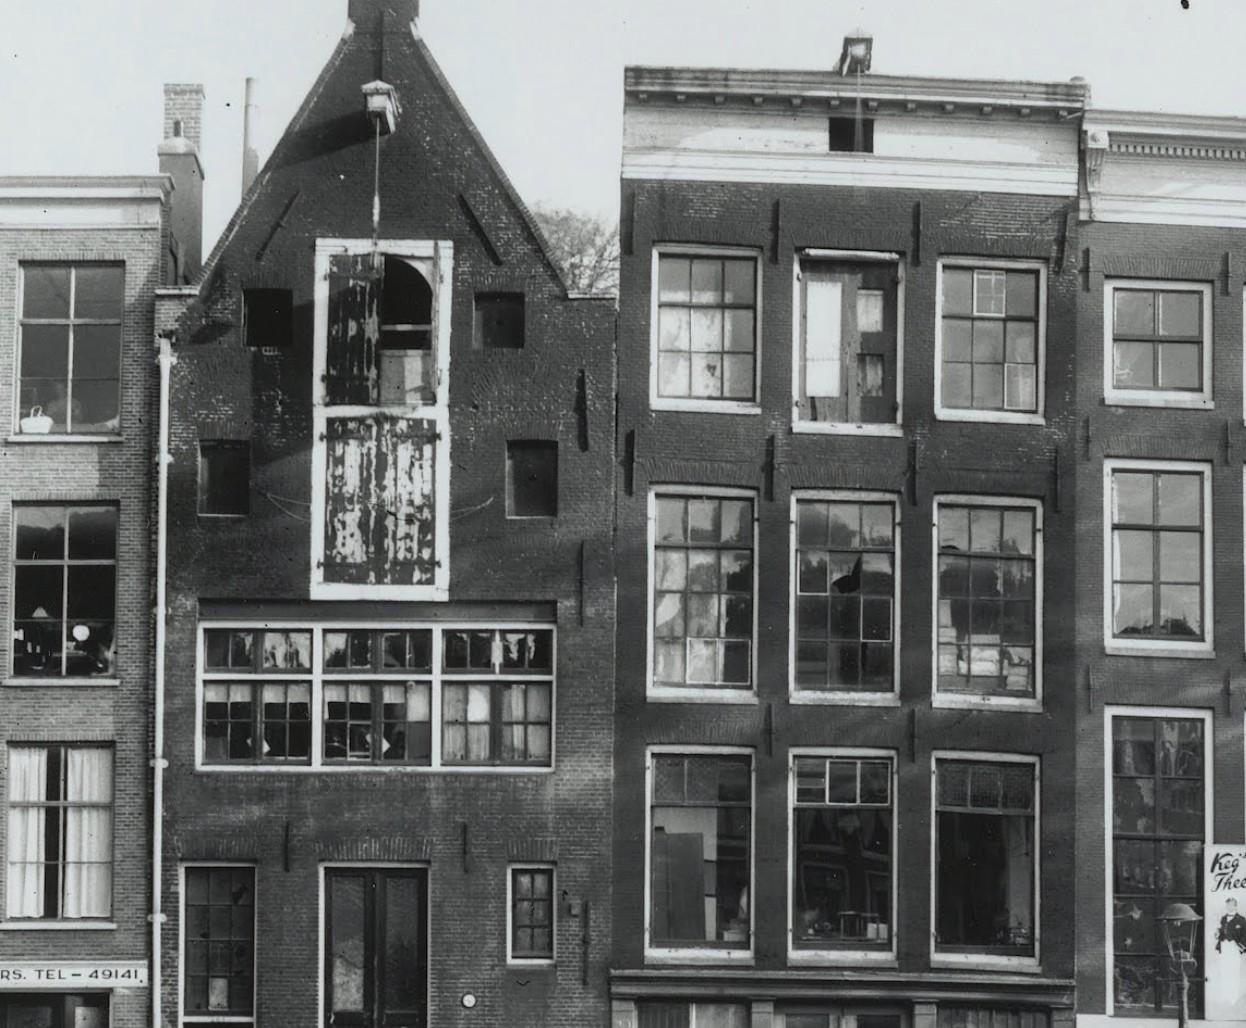 Projeto Do Google Permite Visita Online A Casa Onde Viveu Anne Frank Revista Galileu Sociedade